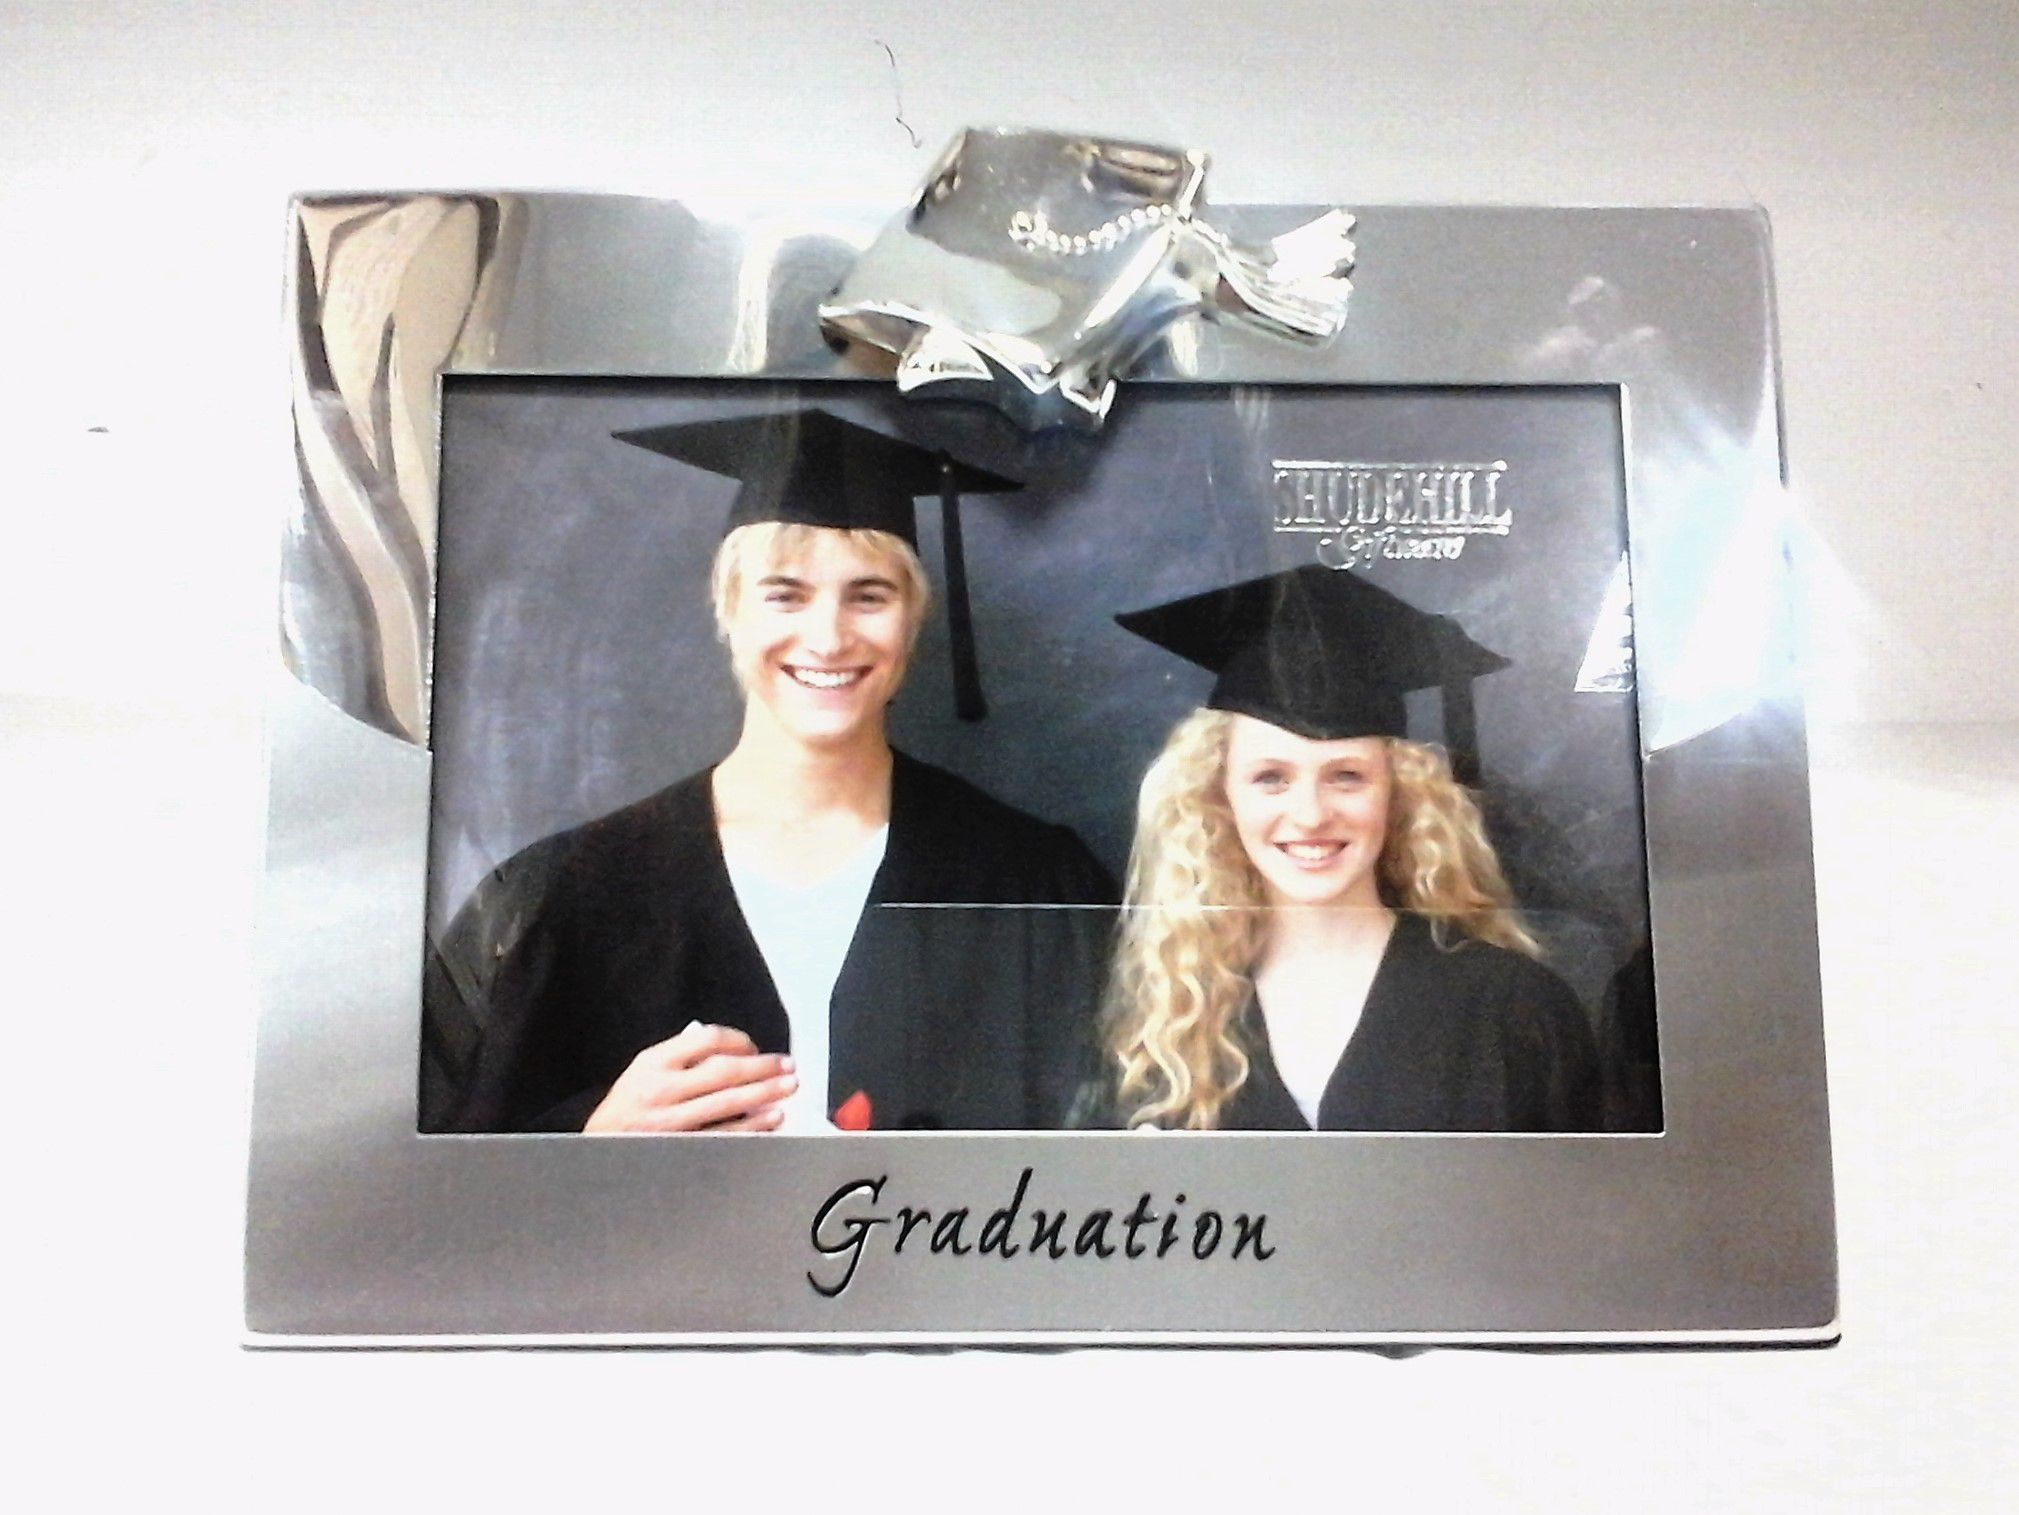 60320 Graduation Two Tone 4x6 Photo Frame